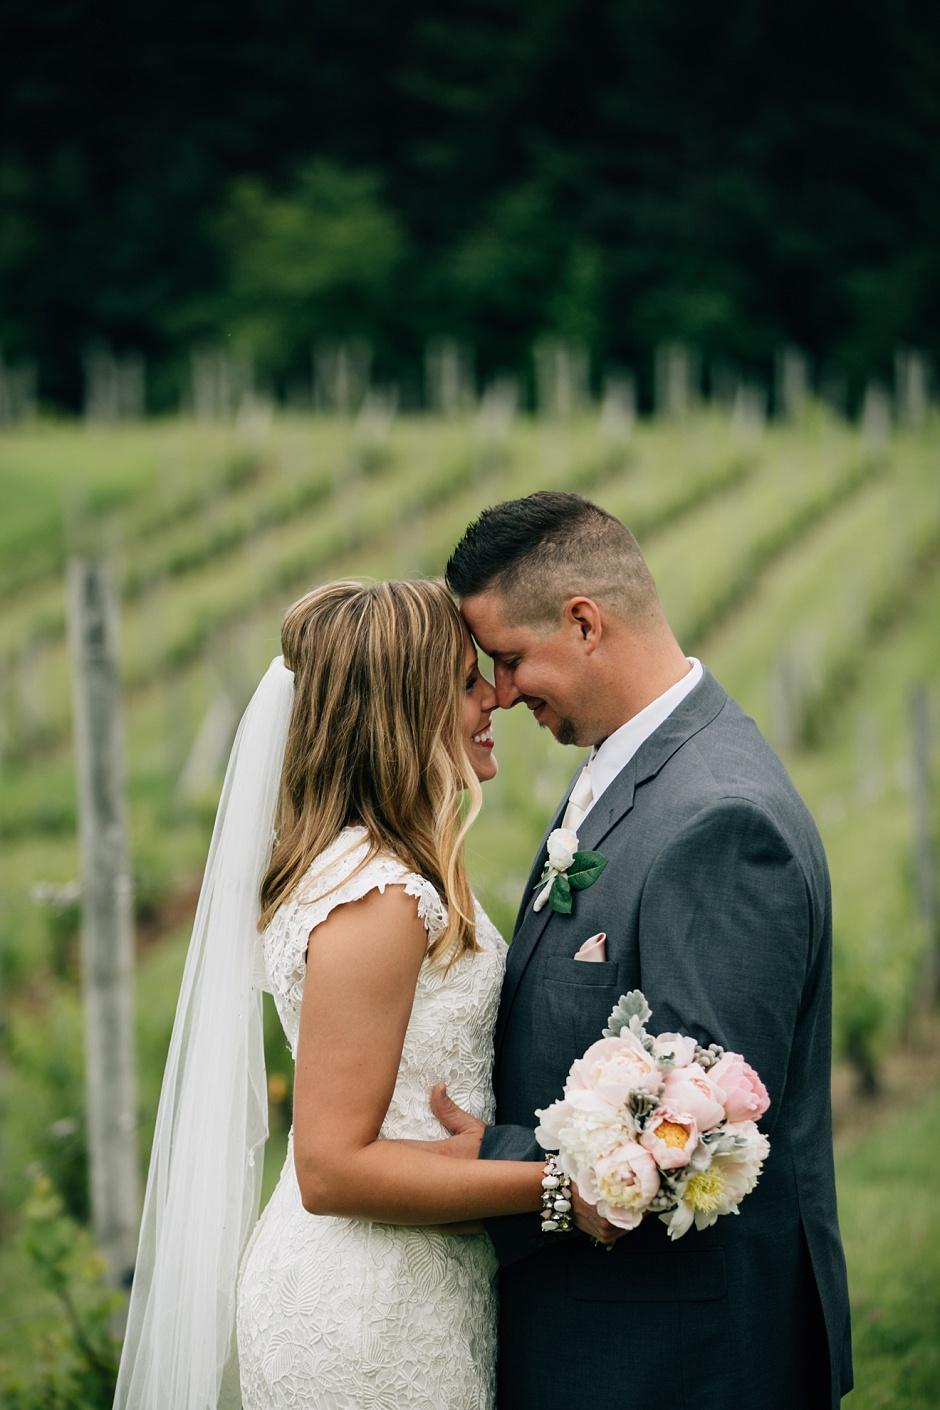 traverse_city_michigan_wedding_photographer080